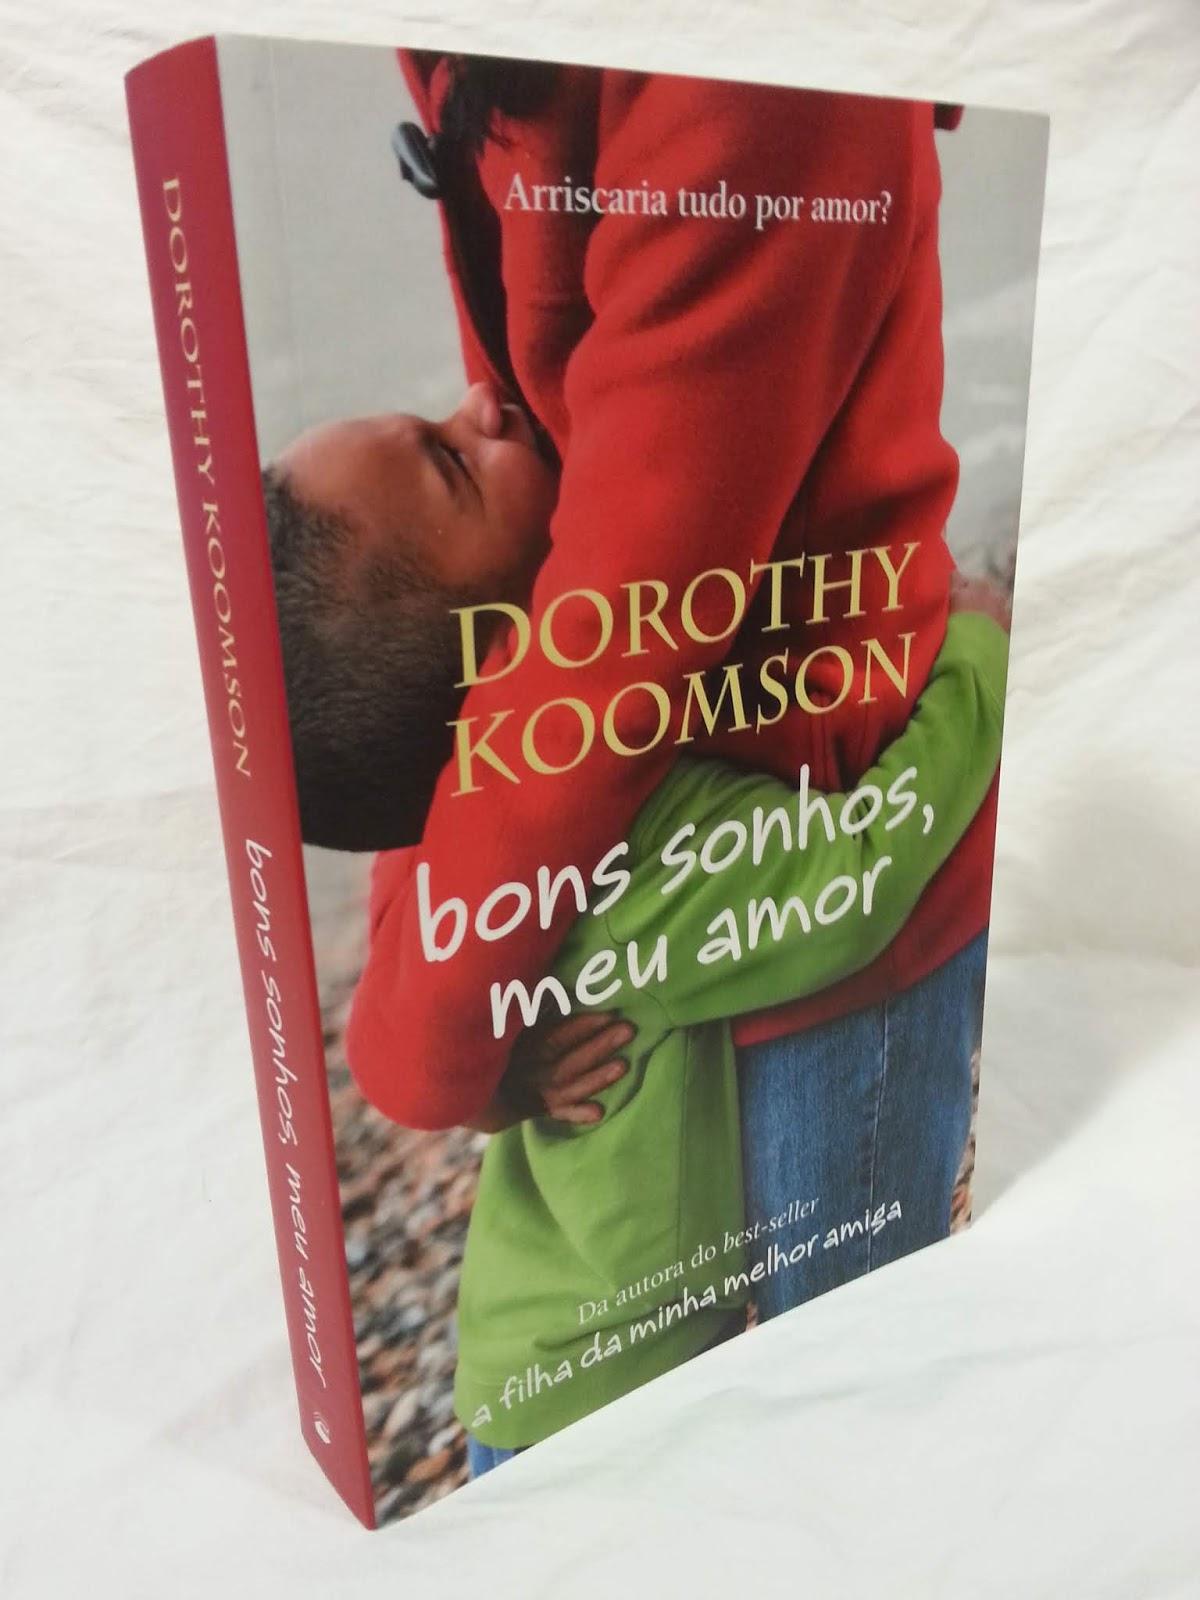 dorothy koomson bons sonhos meu amor